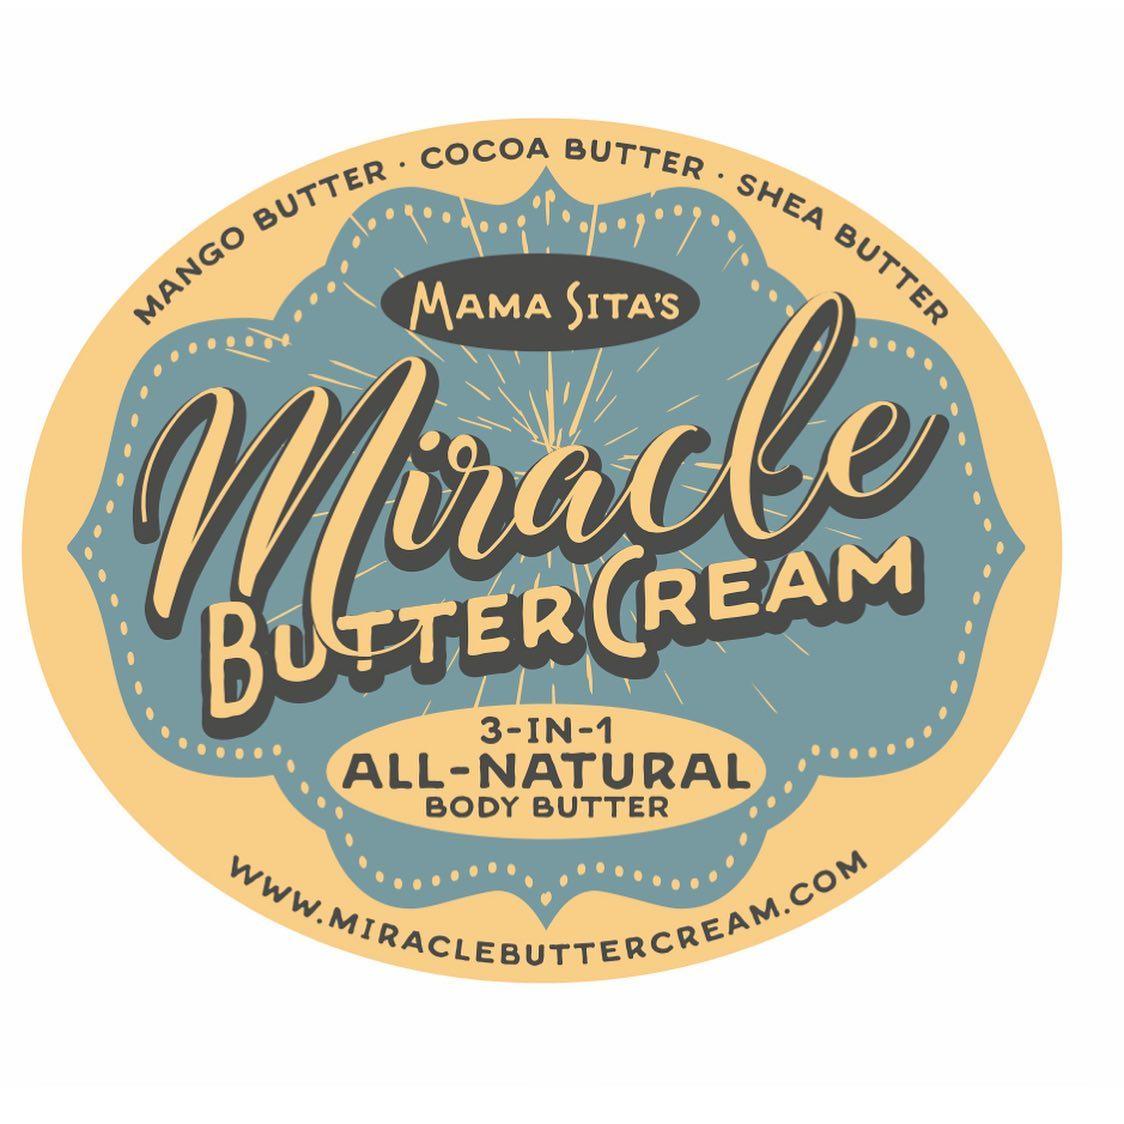 Mama Sita's Miracle Butter Cream